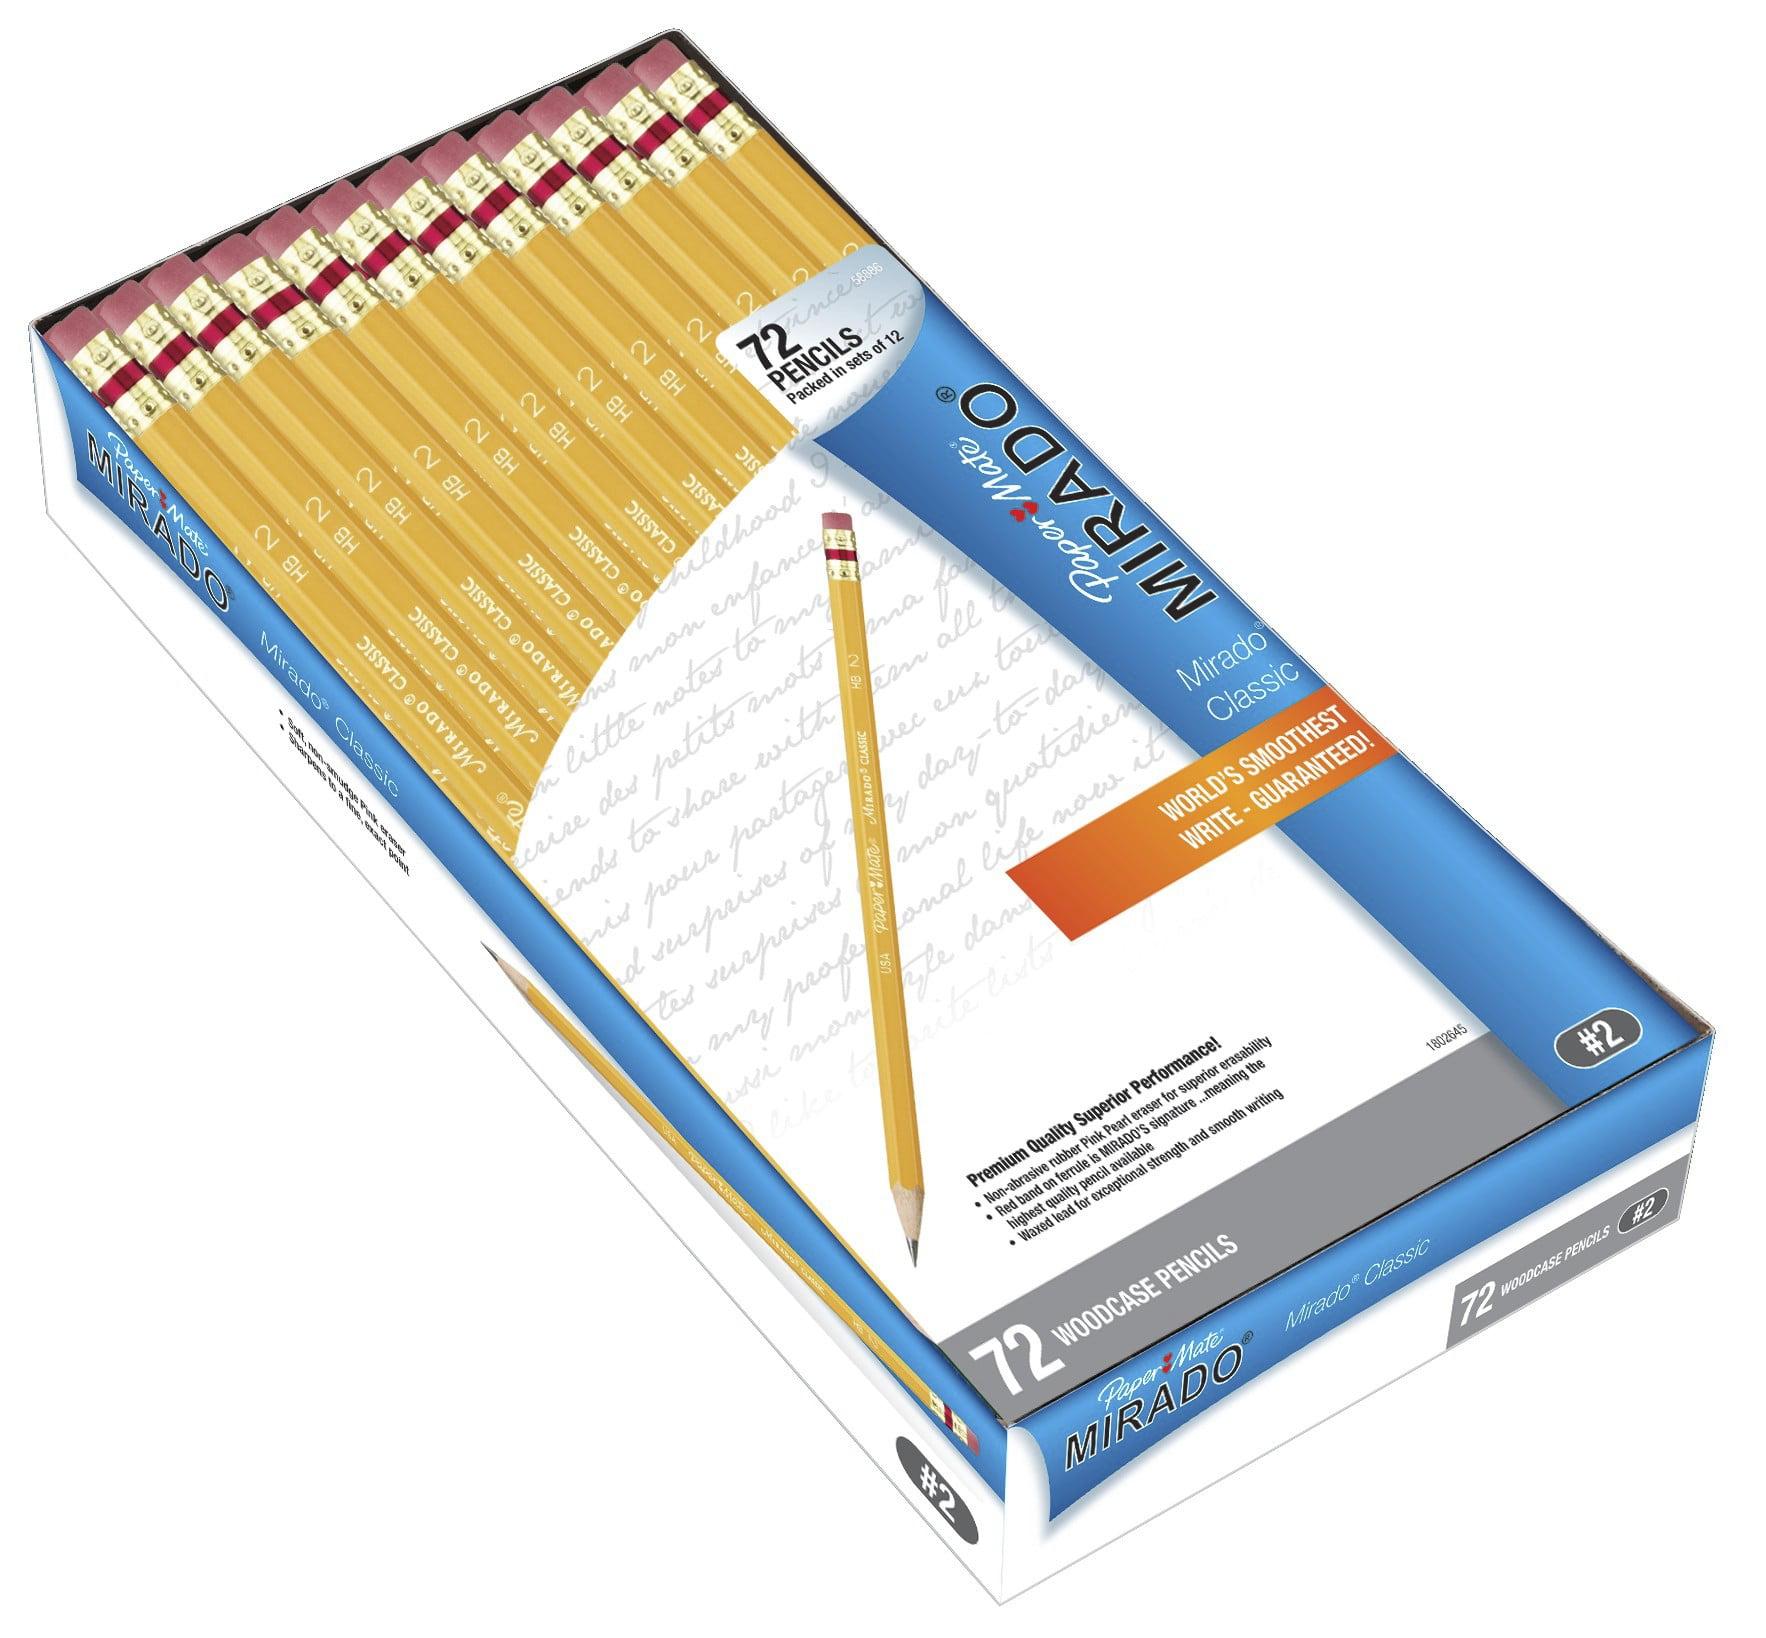 Paper Mate Mirado Classic Woodcase Pencils, #2 HB, 72-Count